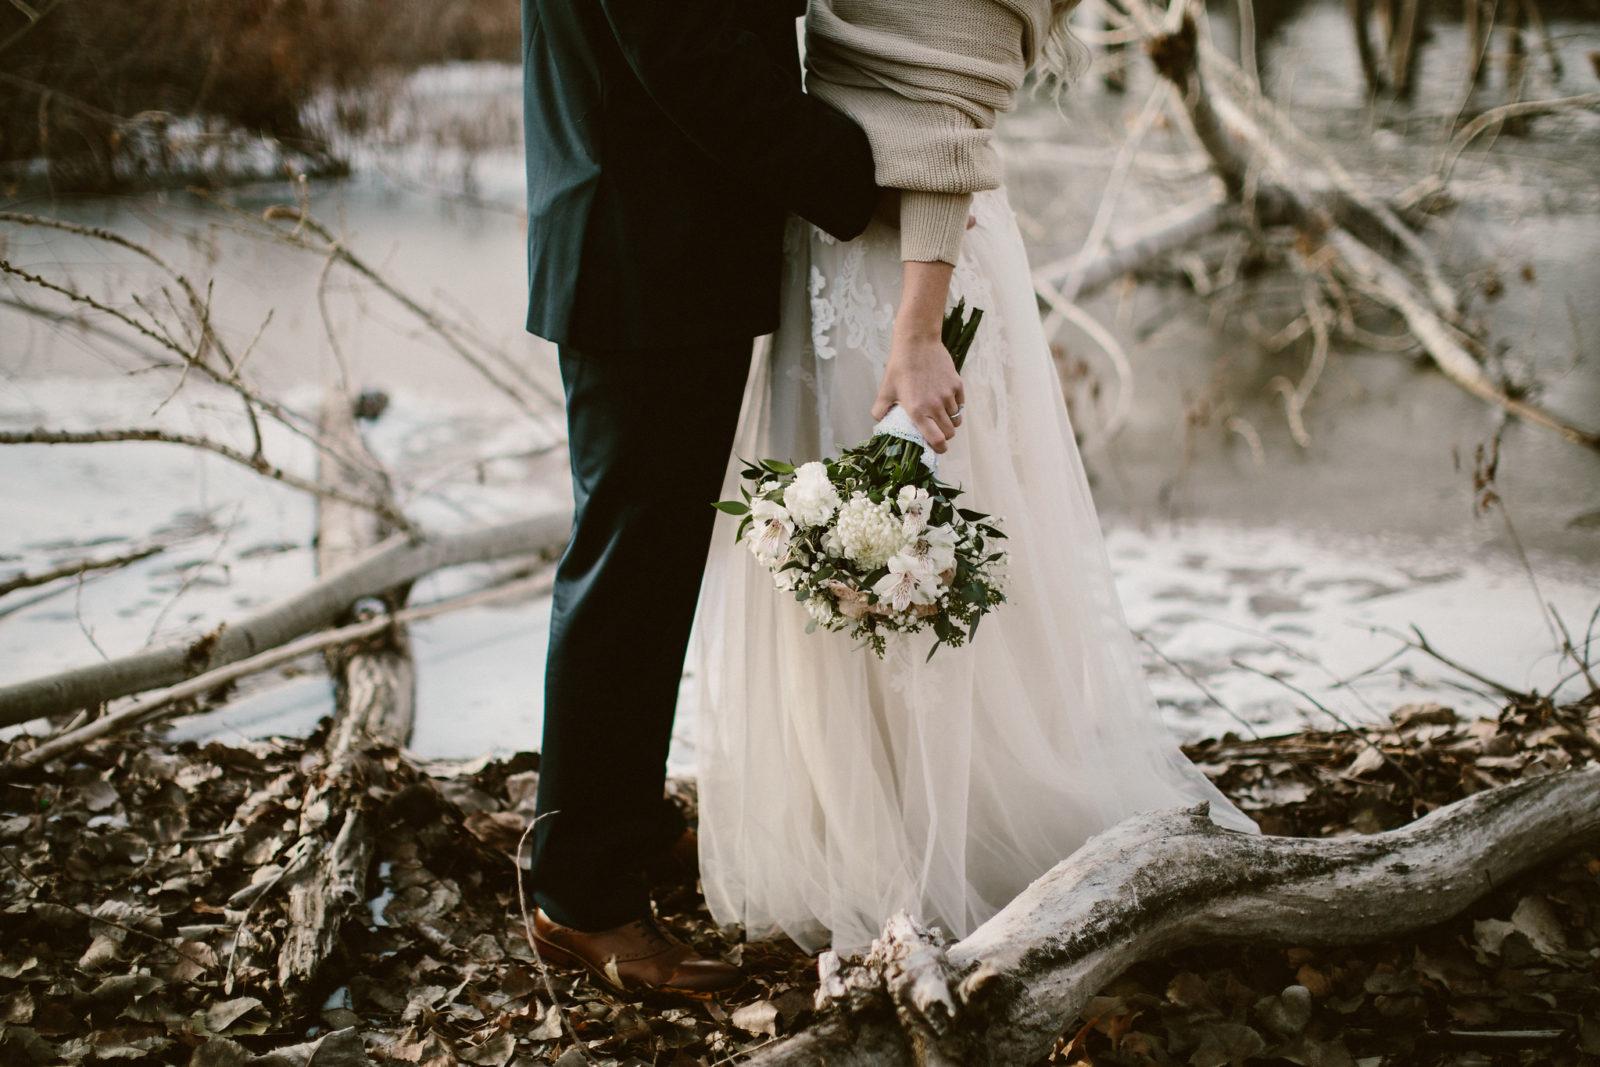 Idaho_wedding_photography_15-1600x1067.jpg